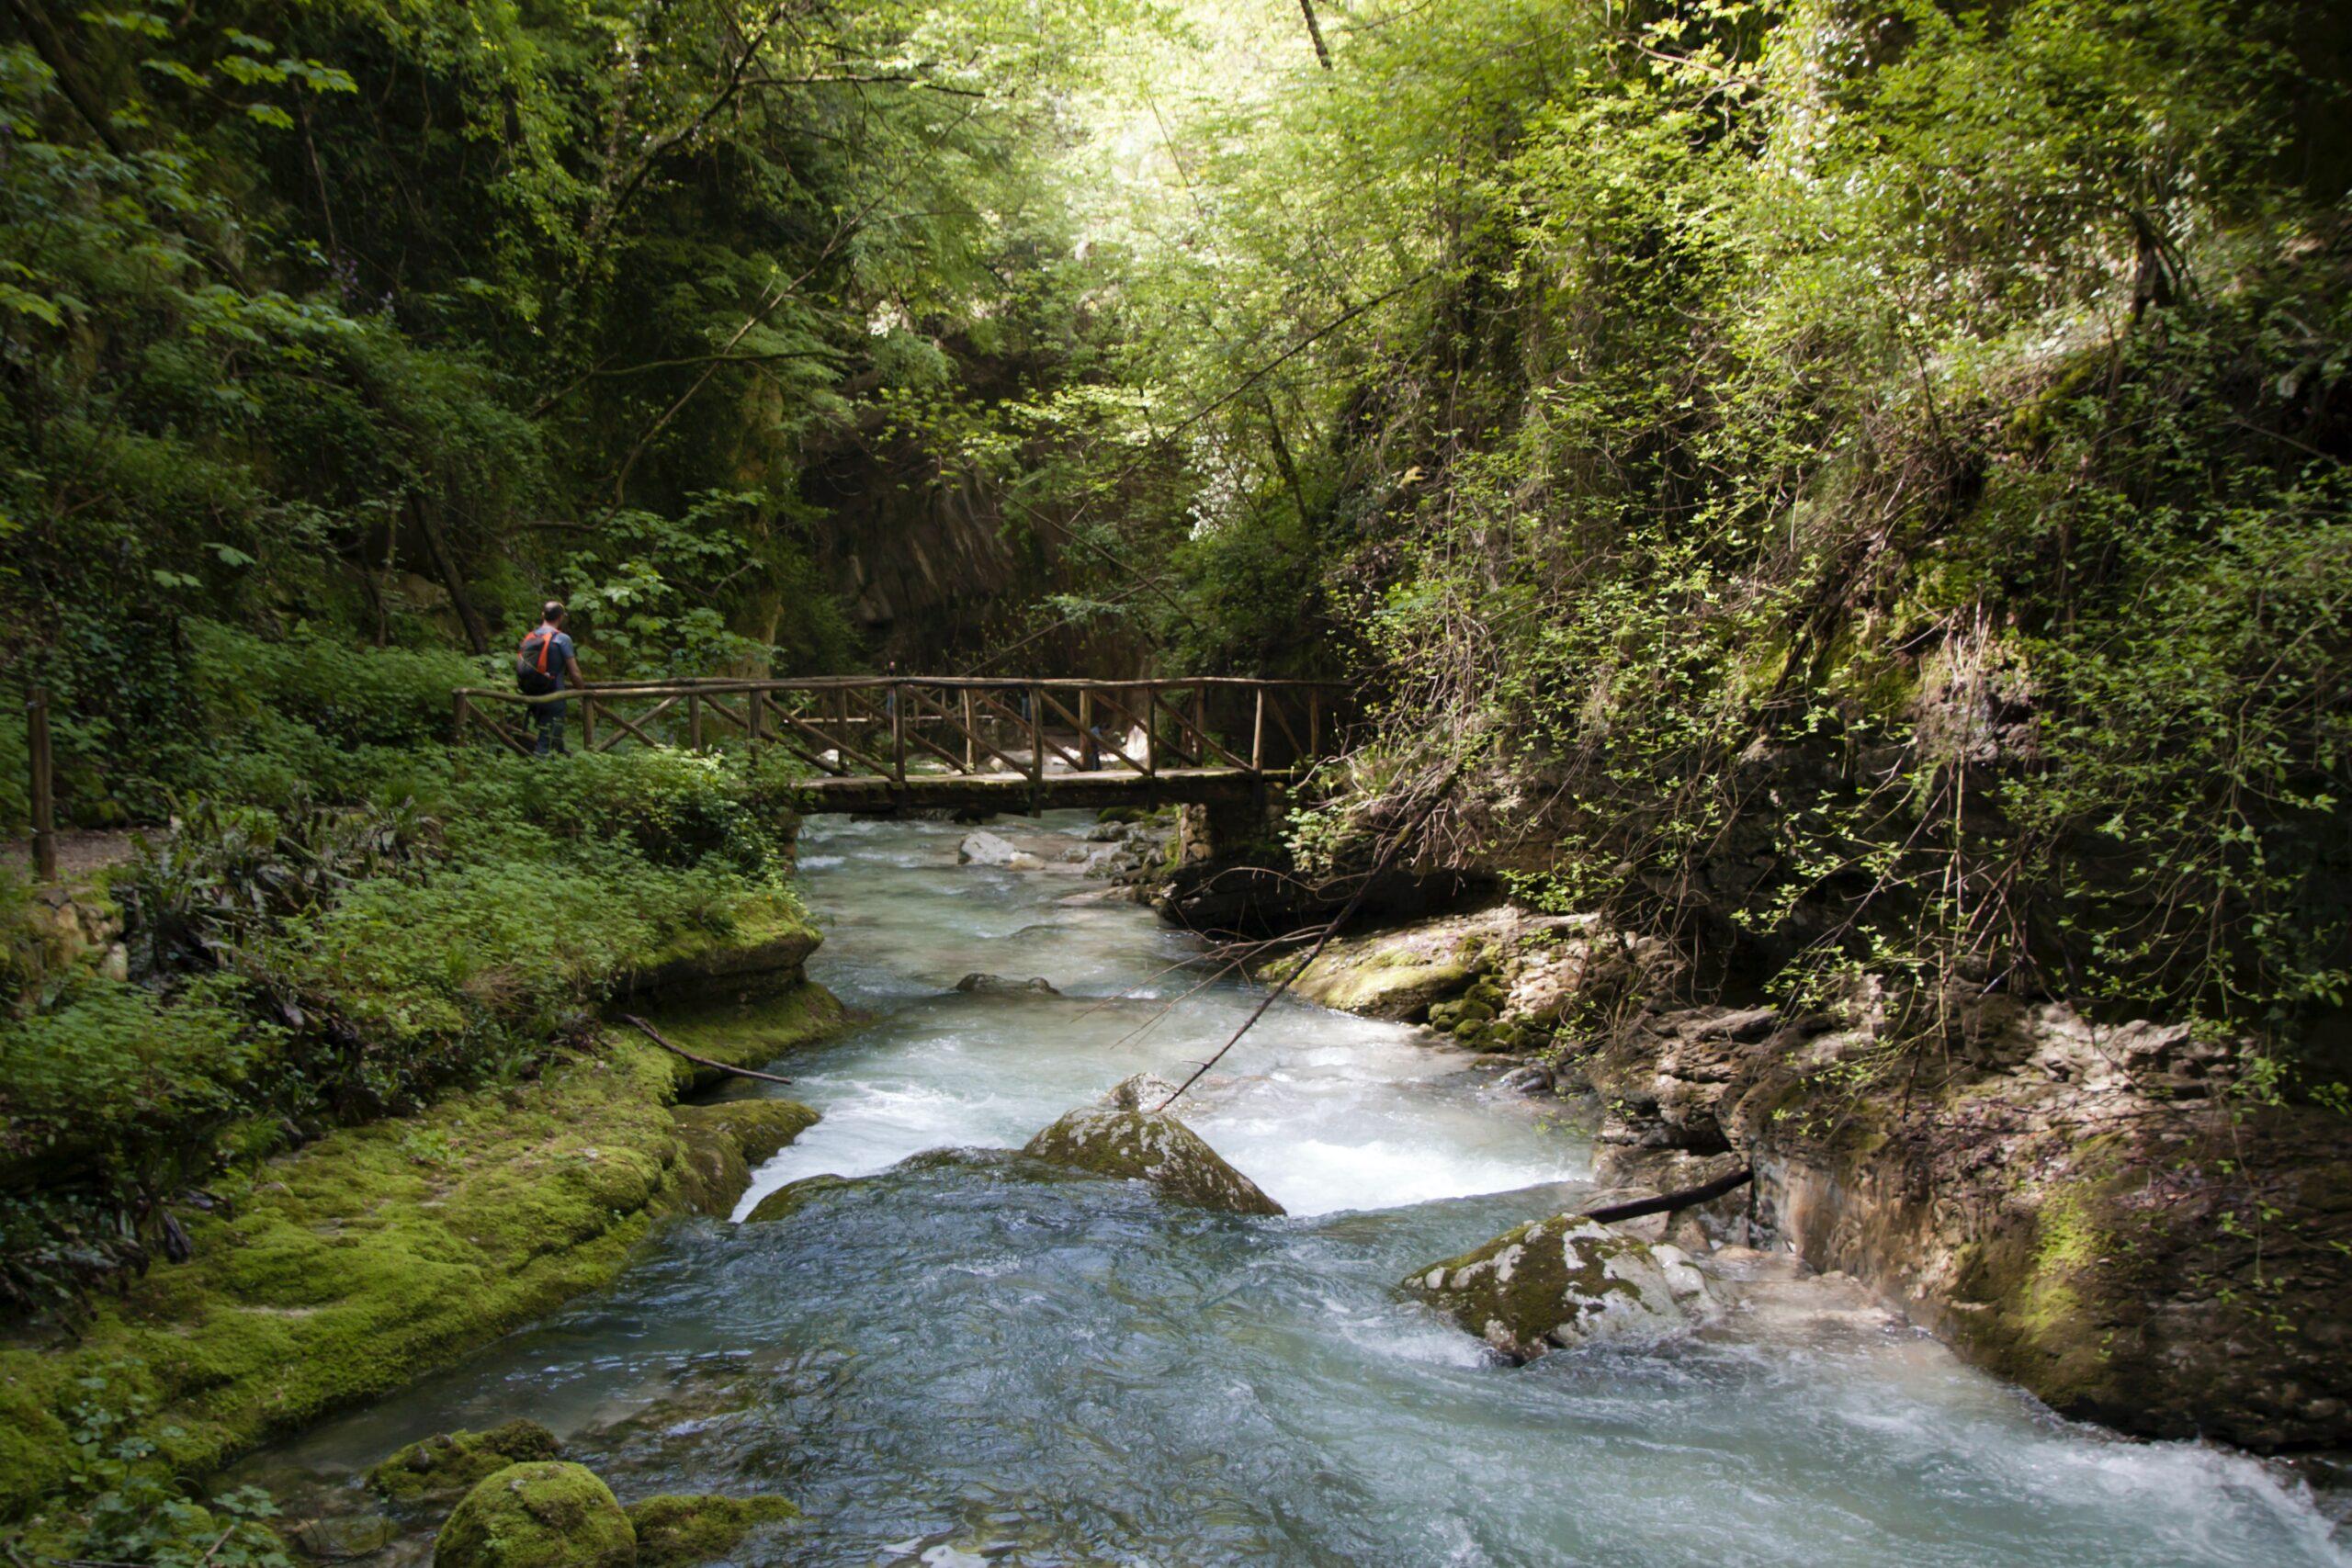 Undertourism and Post-Covid sceniarios